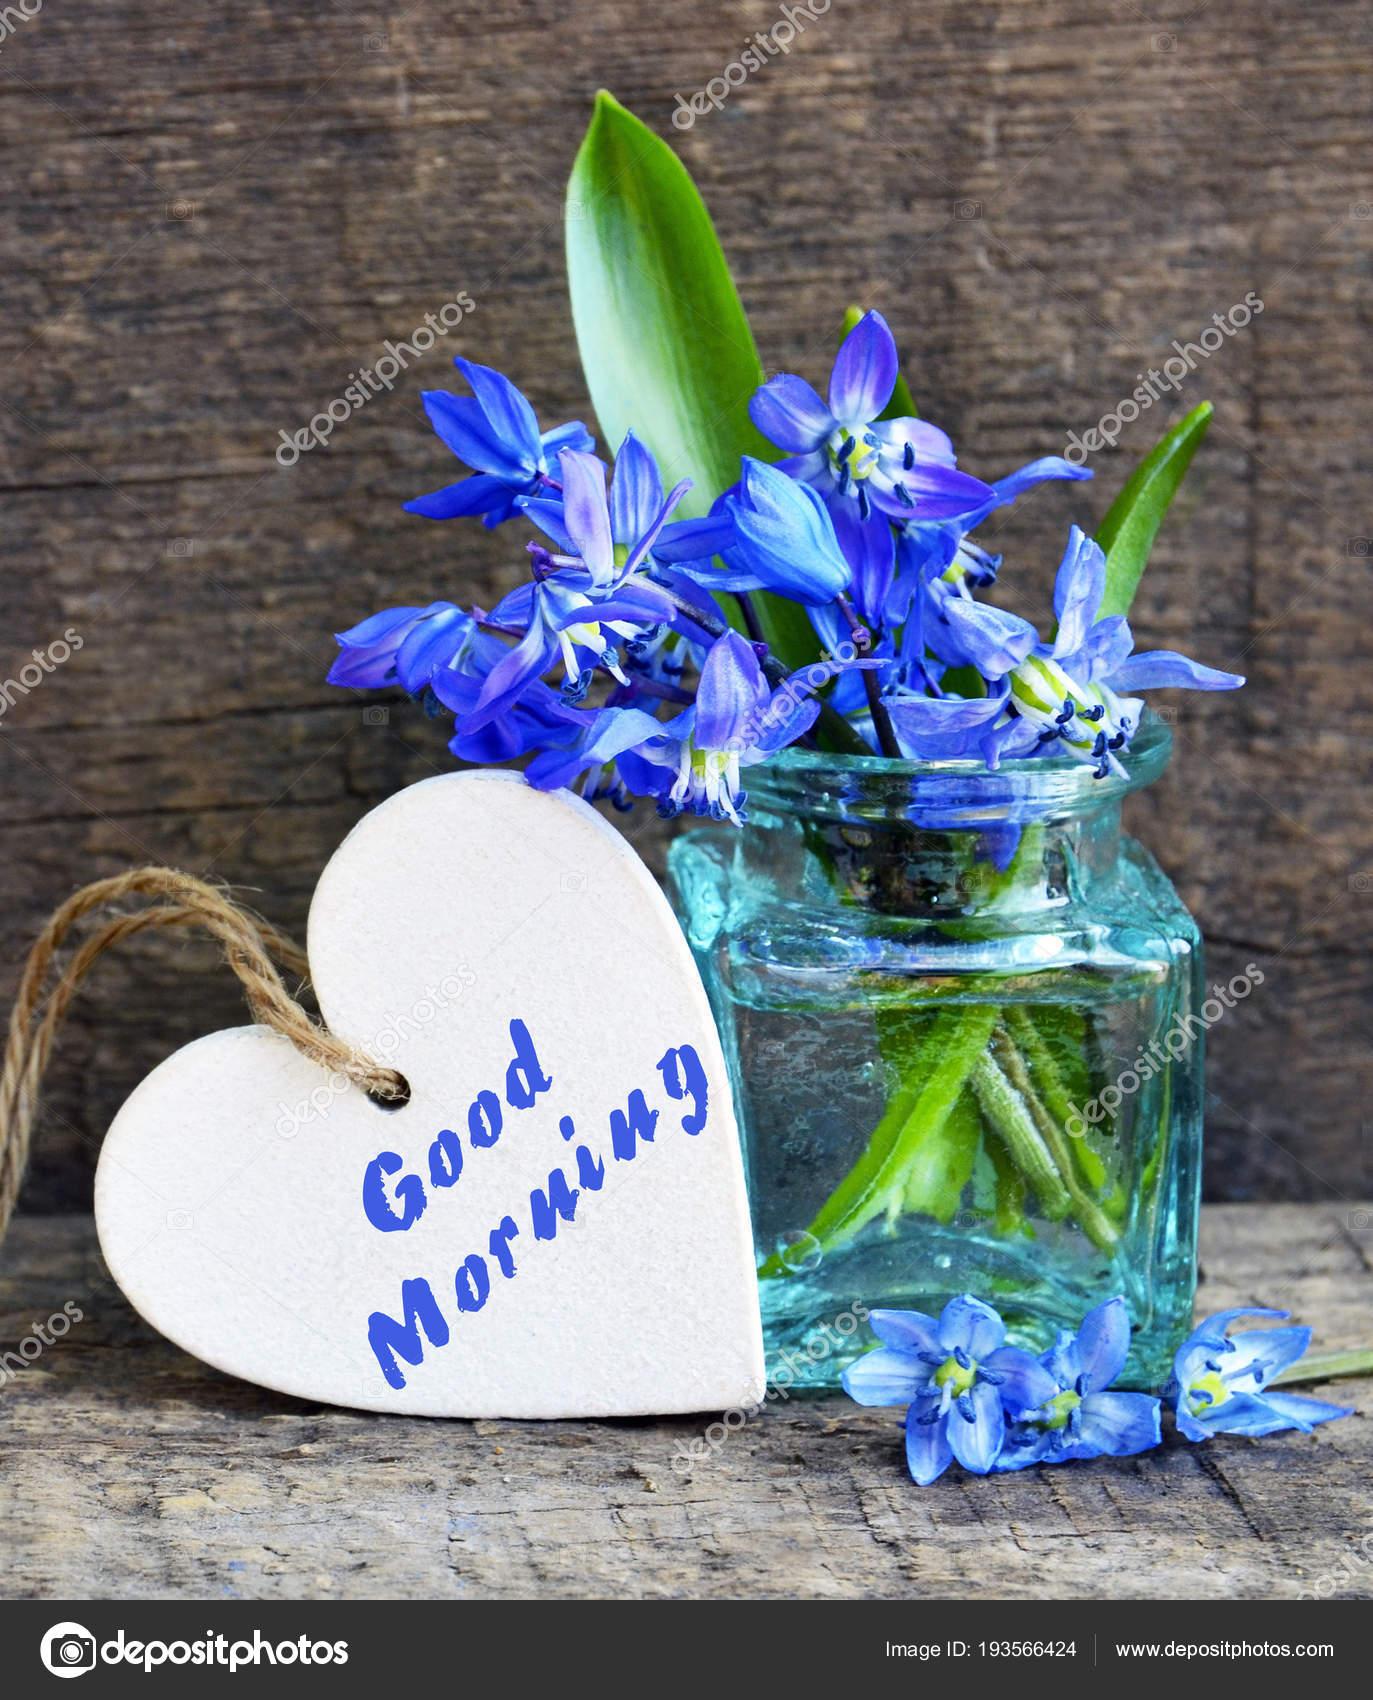 Good Morning Decorative White Wooden Heart Text Bouquet Blue Scilla